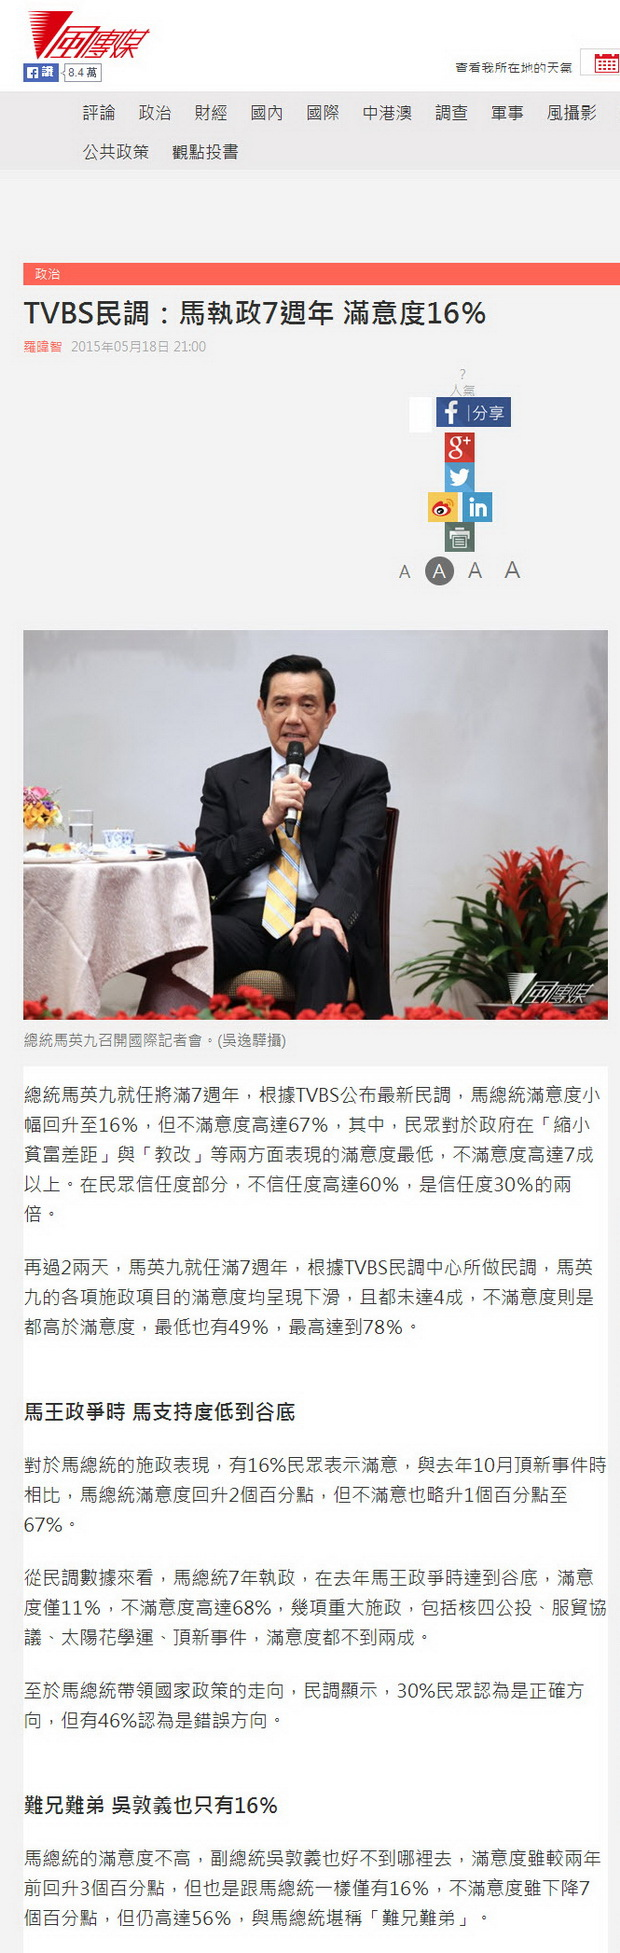 TVBS民調:馬執政7週年 滿意度16%-2015.05.18.jpg